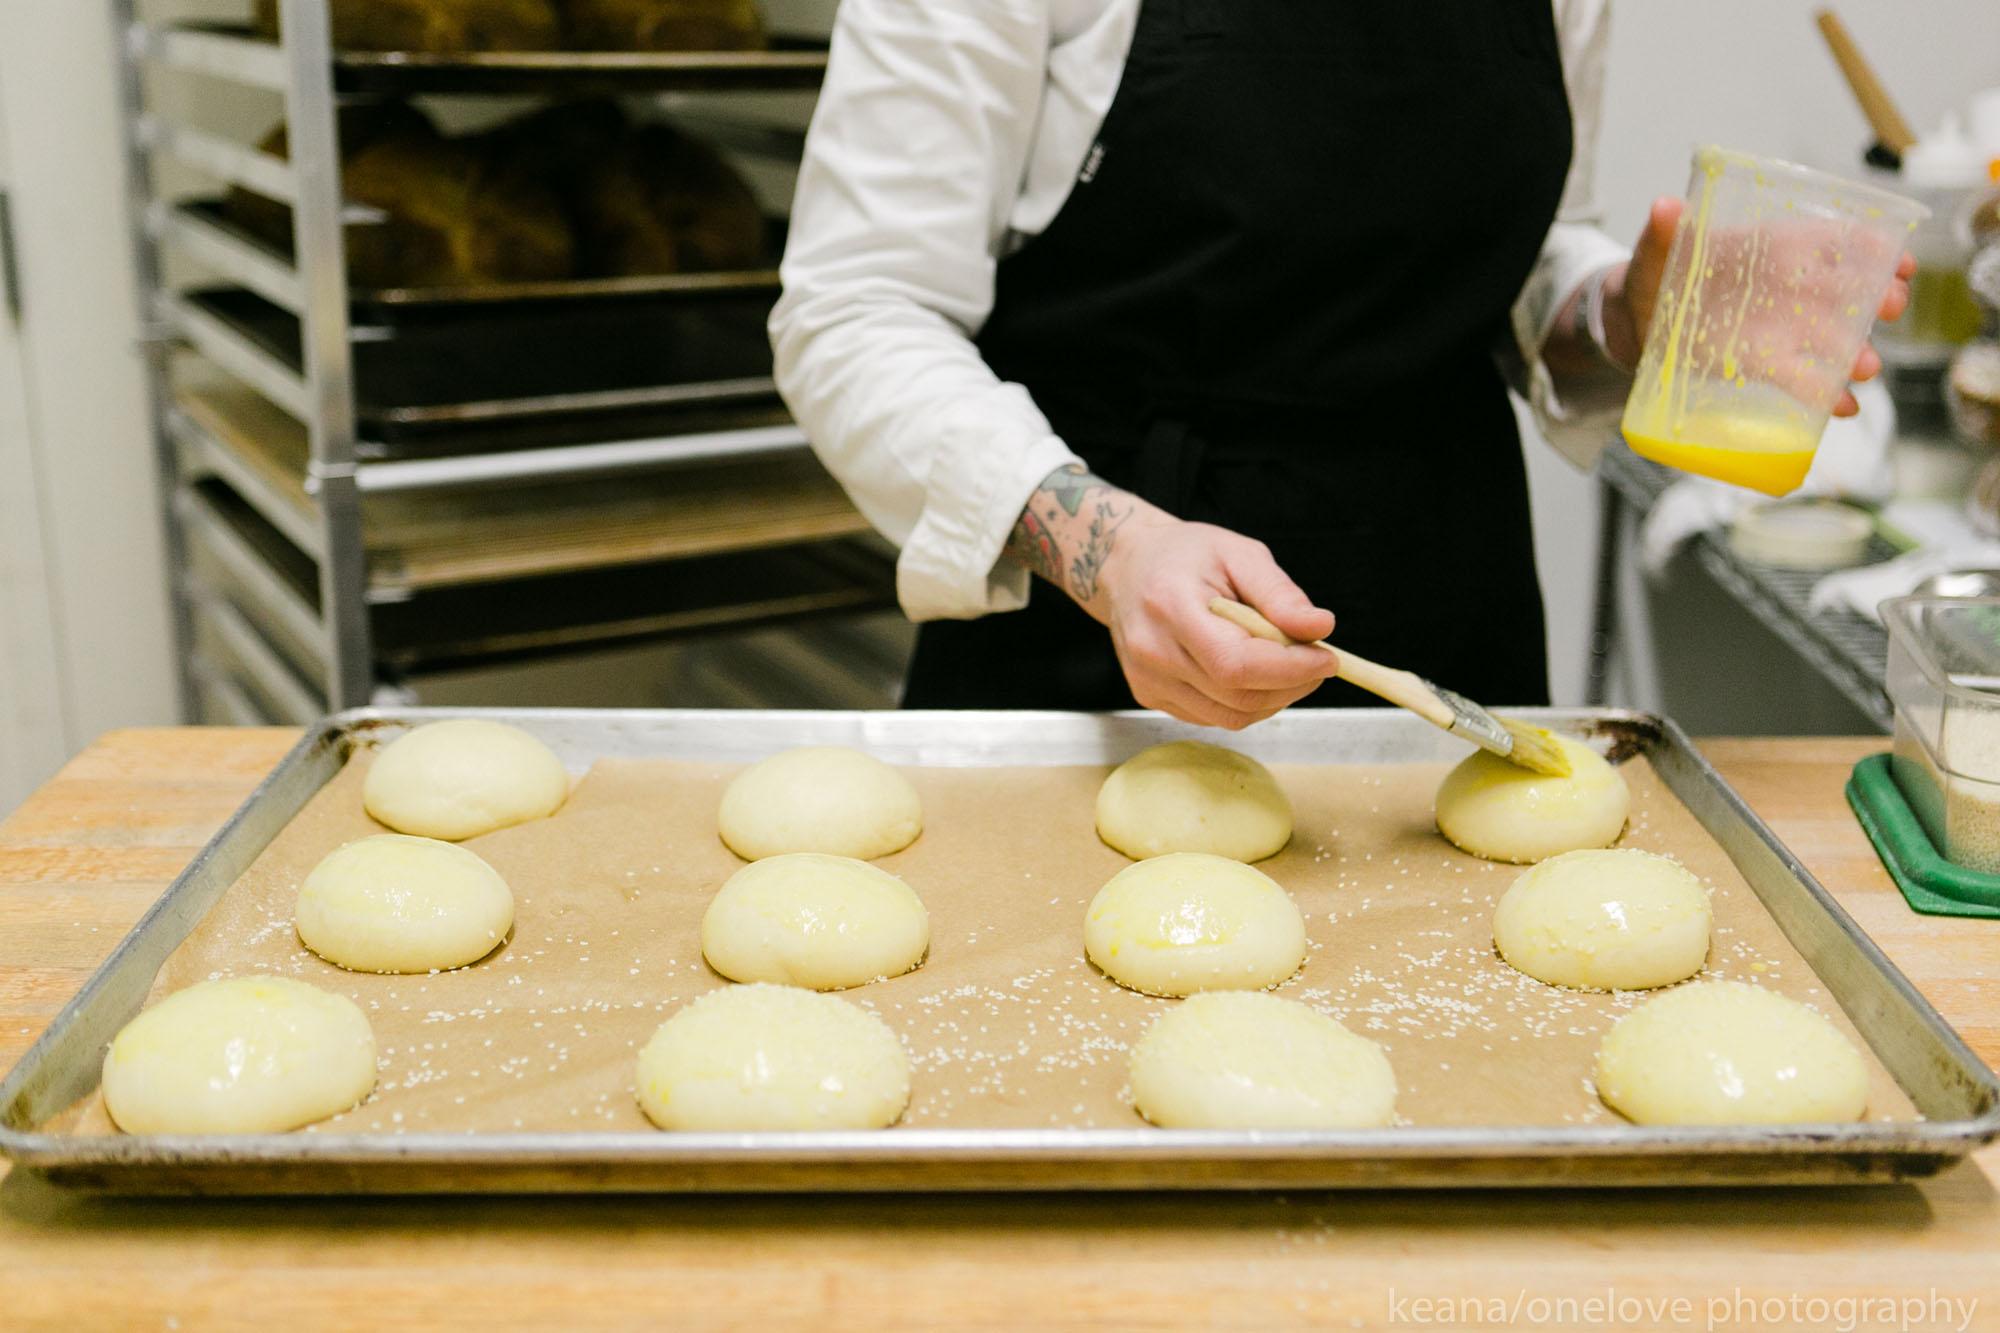 chef_egg_washing_dough_jessicayarr.jpg